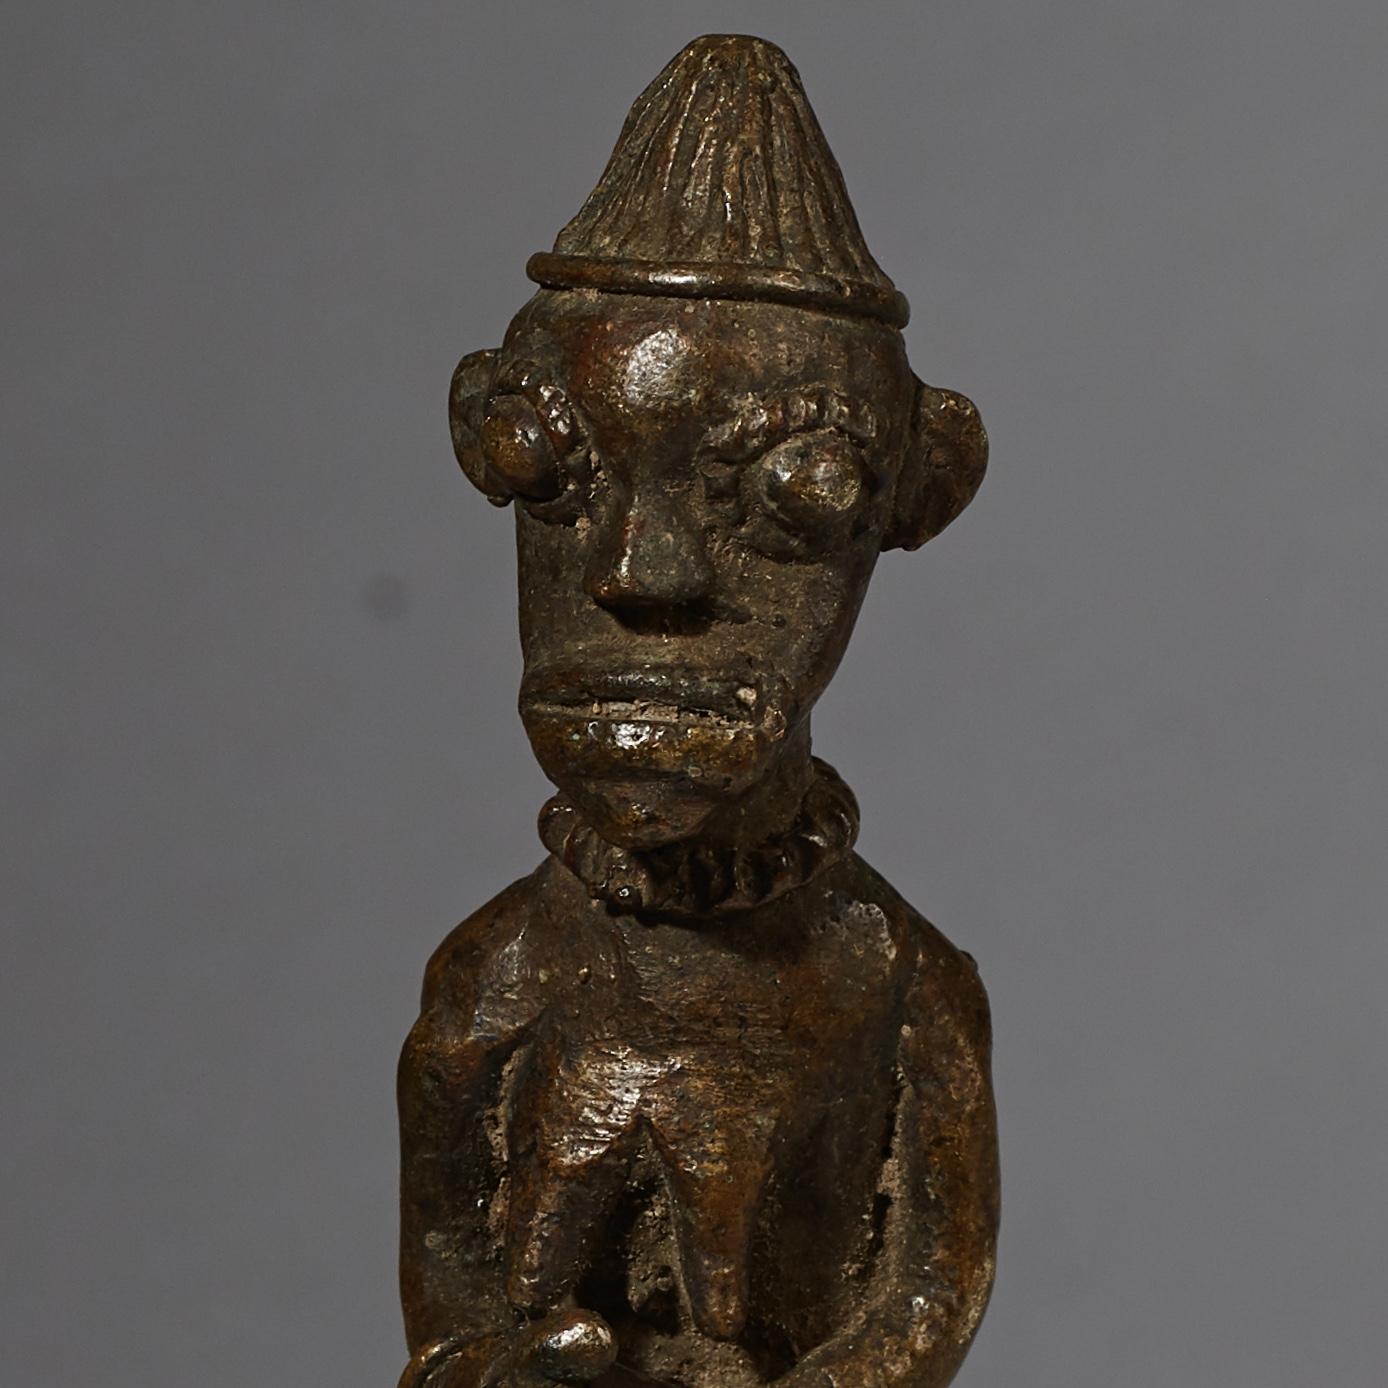 A LOVELY OGBONI FIGURATIVE BRONZE, YORUBA TRIBE NIGERIA ( No 2555 )